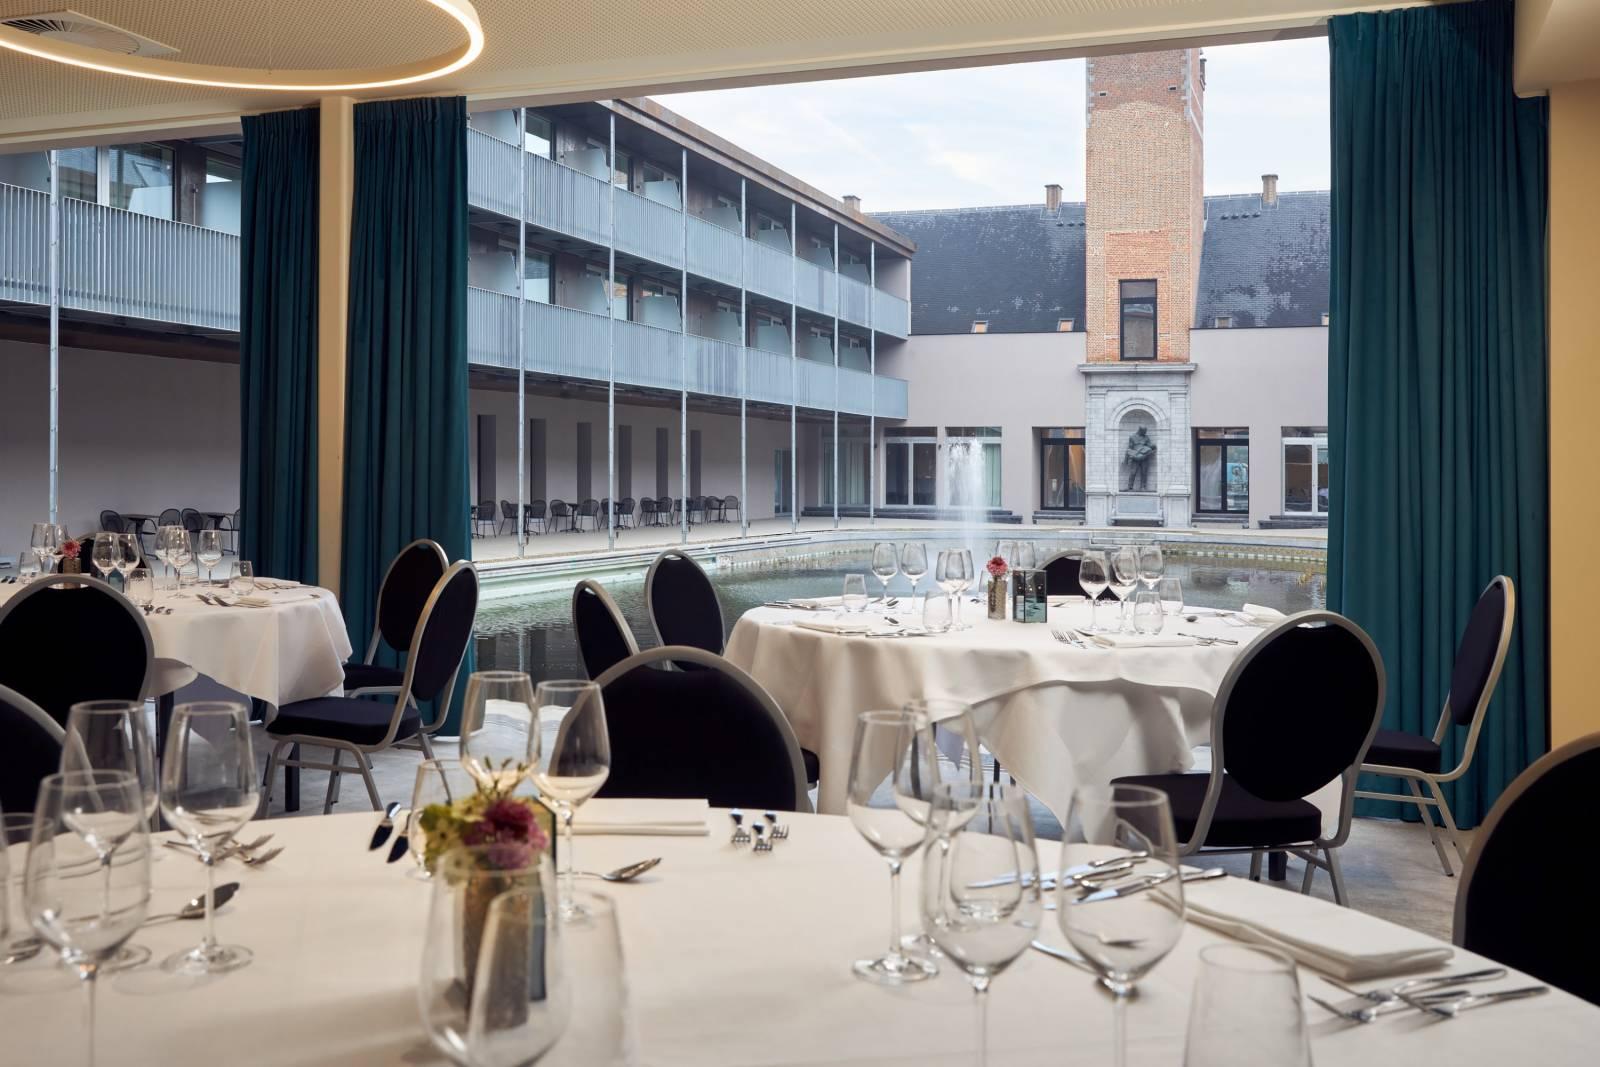 Feestal - Van der Valk hotel Mechelen - House of Weddings (12)